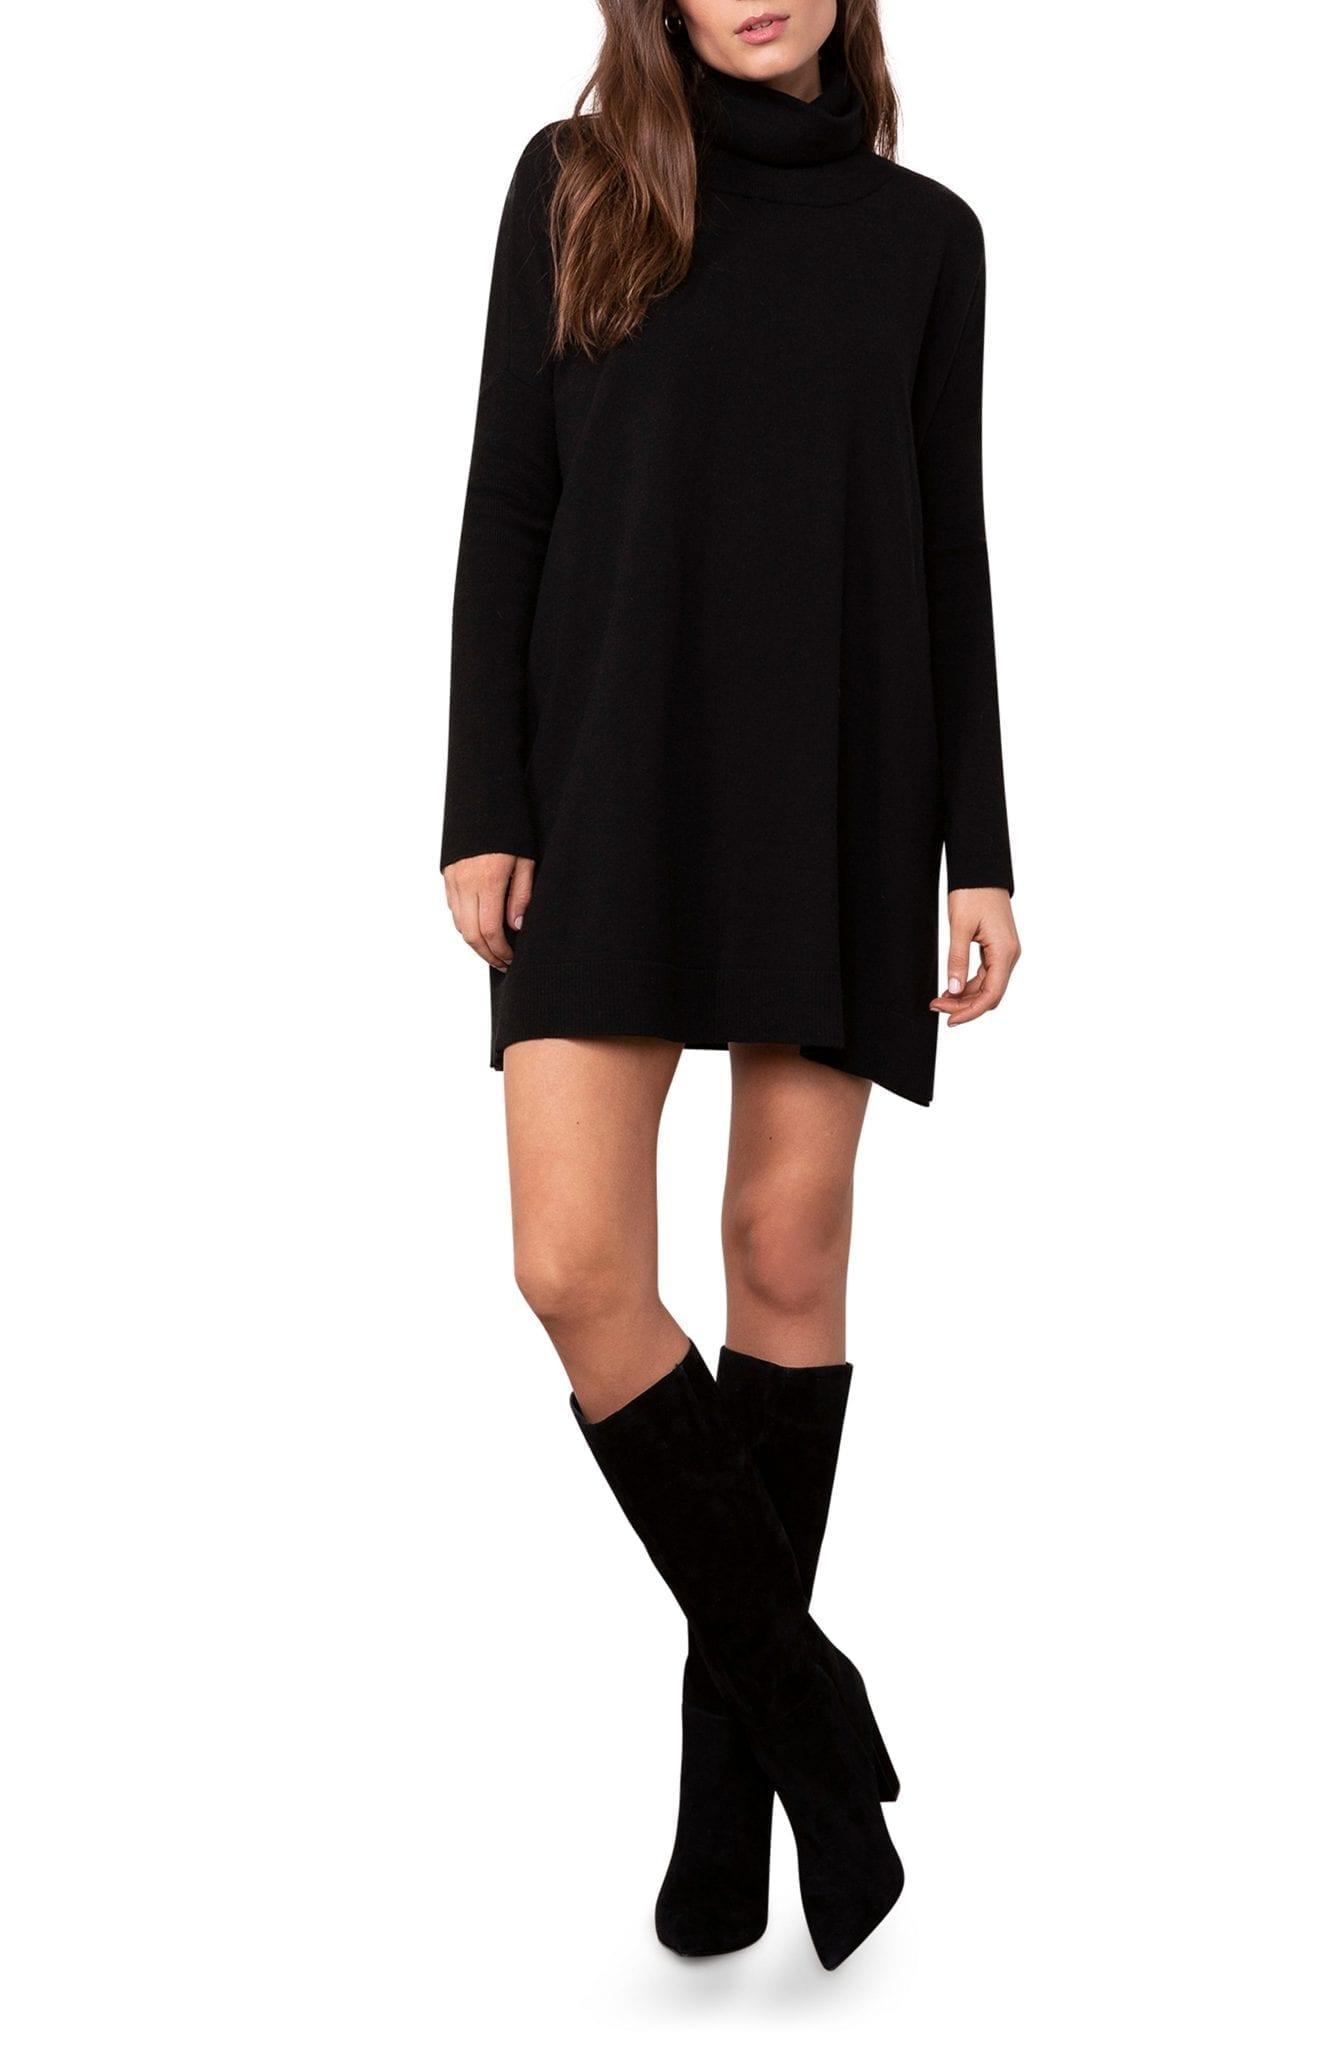 BB DAKOTA Hug Me Tight Turtleneck Long Sleeve Sweater Dress